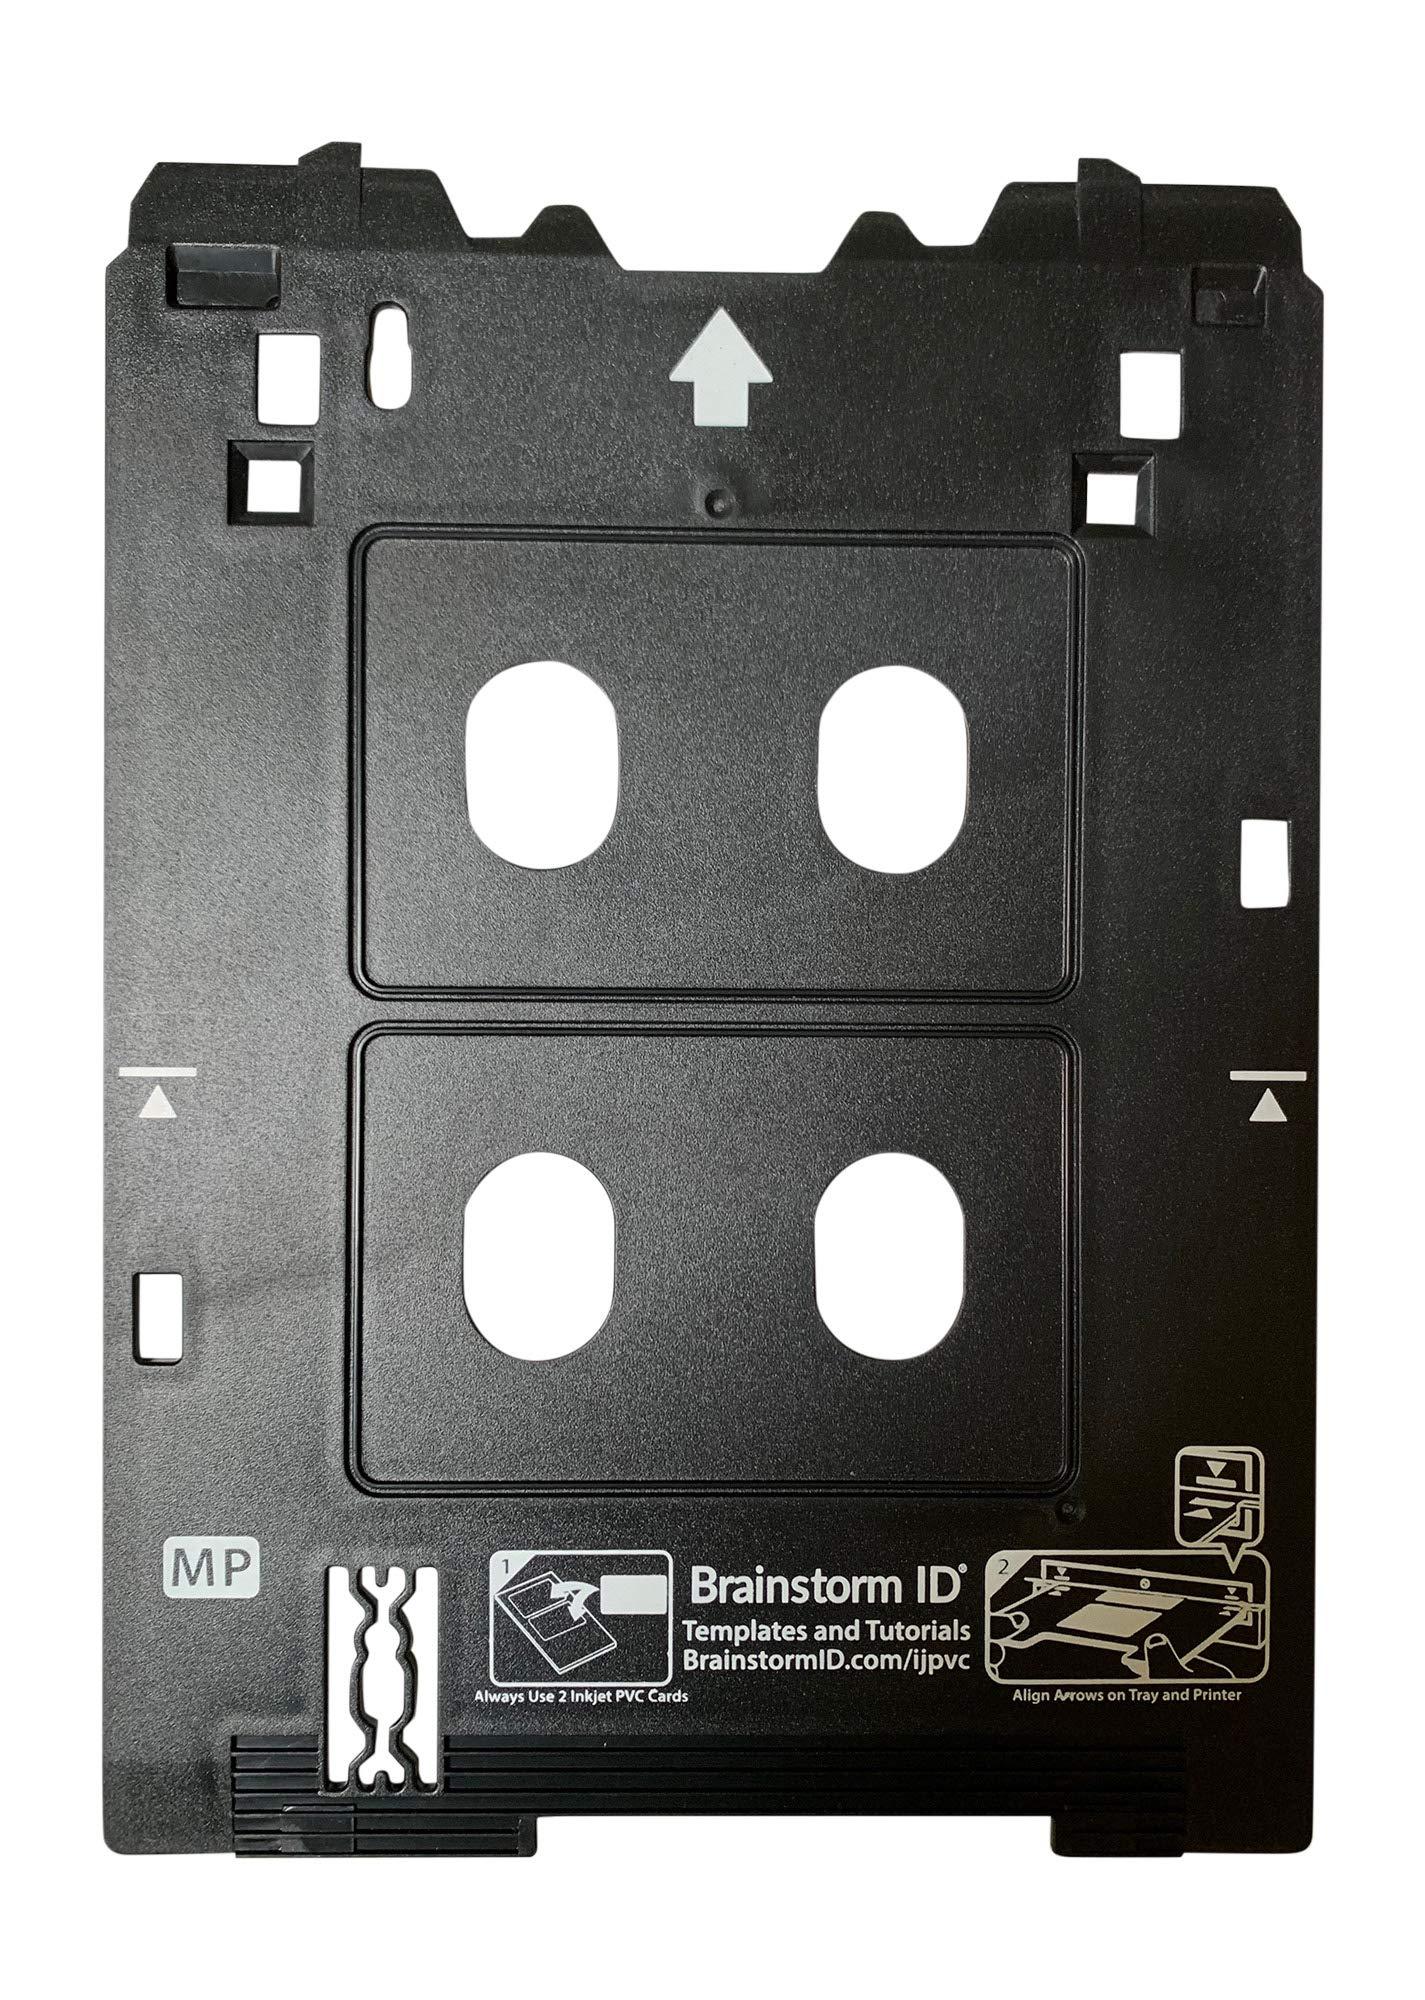 Inkjet PVC Card Tray for Canon PIXMA TS82xx and TS95xx Series Printers (Canon MP/Multi-Purpose Tray Printers) by Brainstorm ID by Brainstorm ID